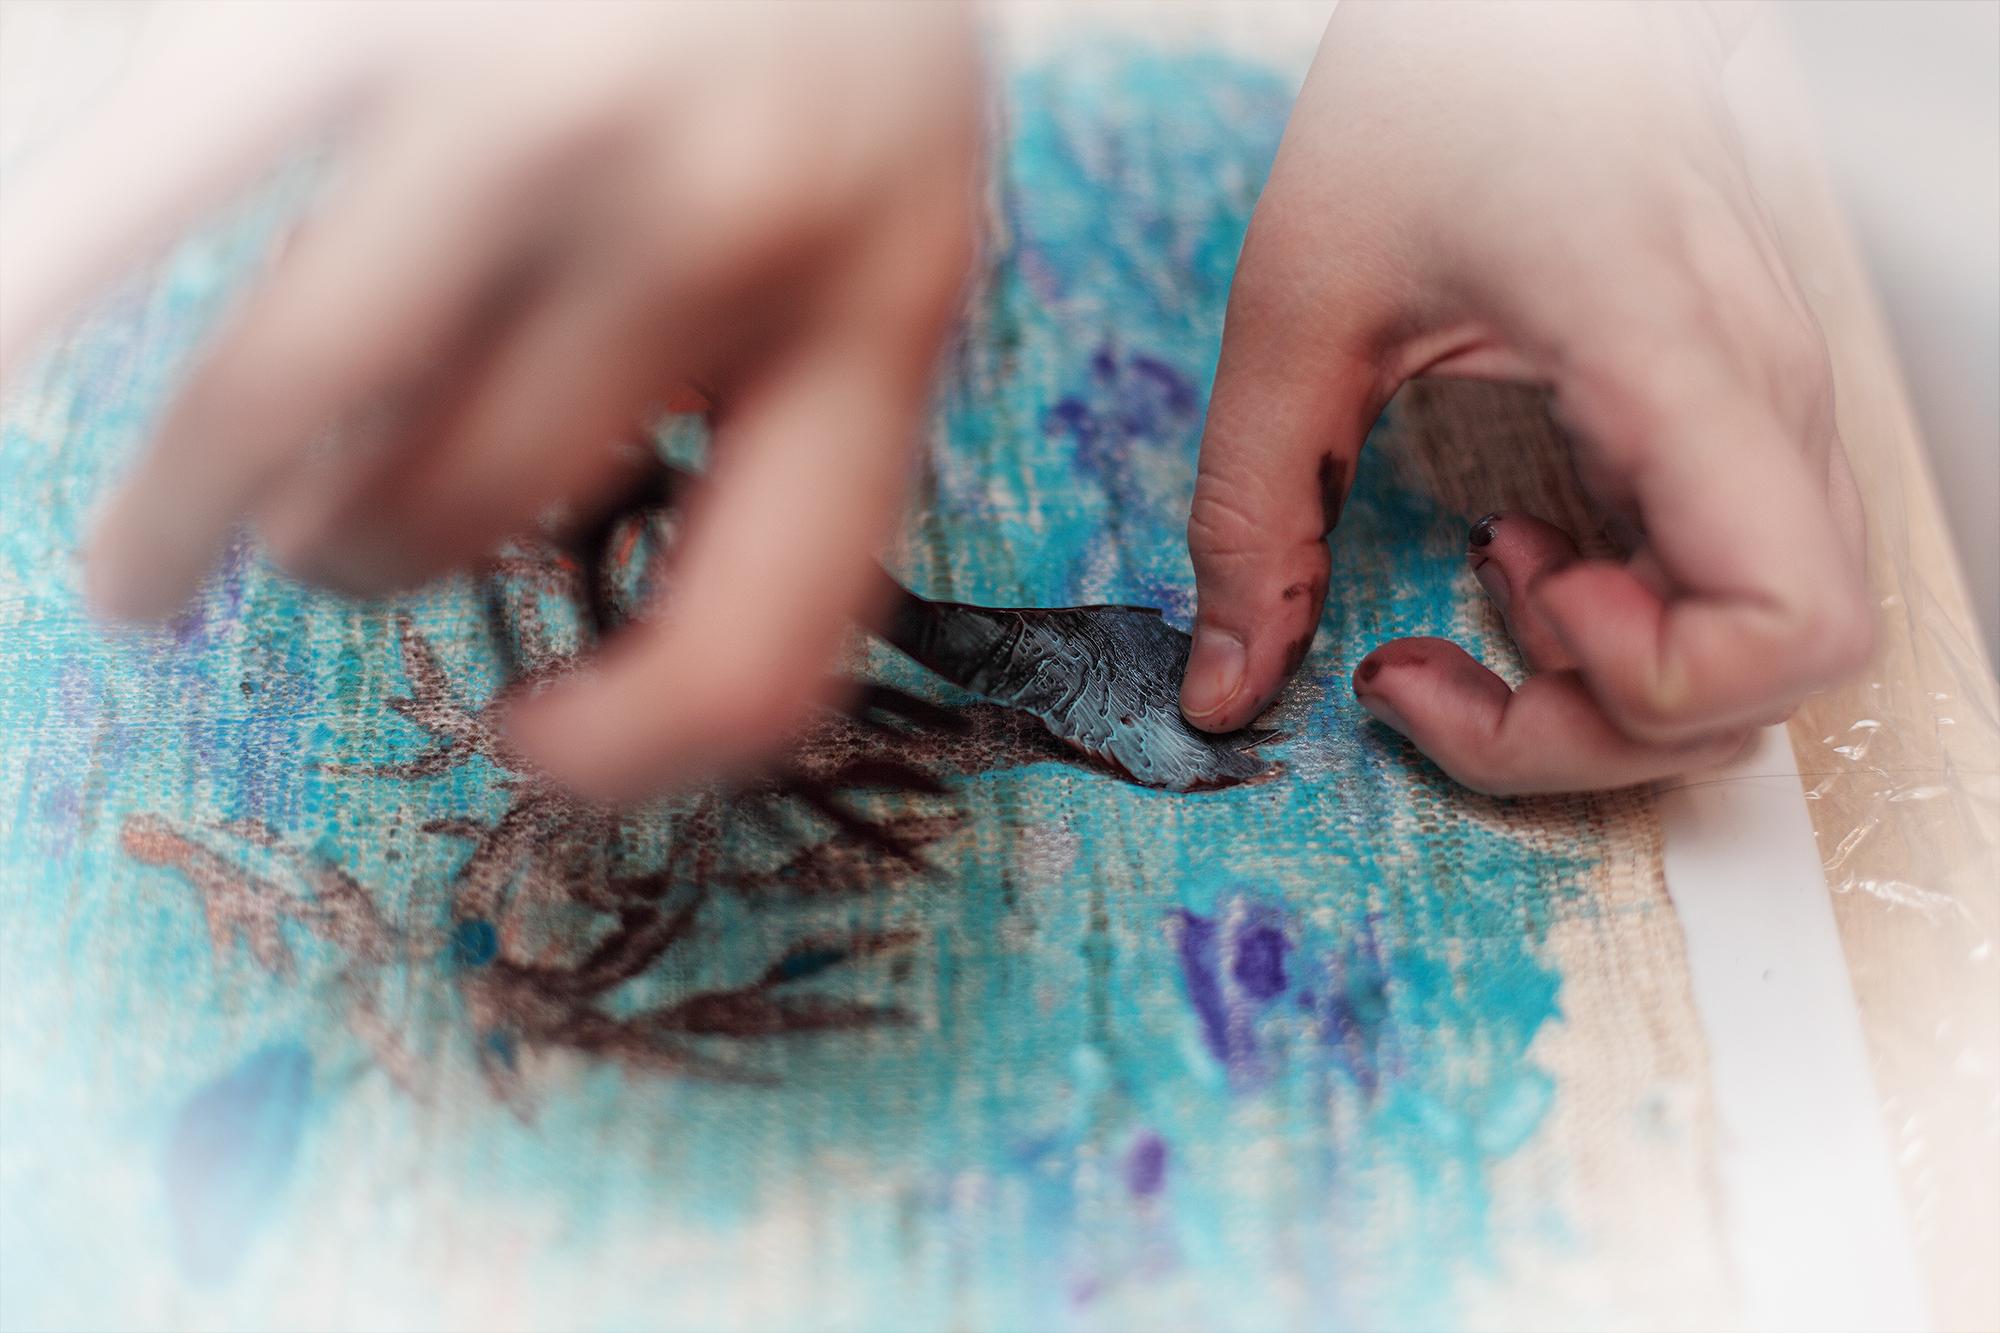 monotype, lesson, Master Class, silk, paint, workshop, hand print, монотипия, мастер-класс, семинар, урок, ручная печать, ткань, принт, шелк, tree, дерево